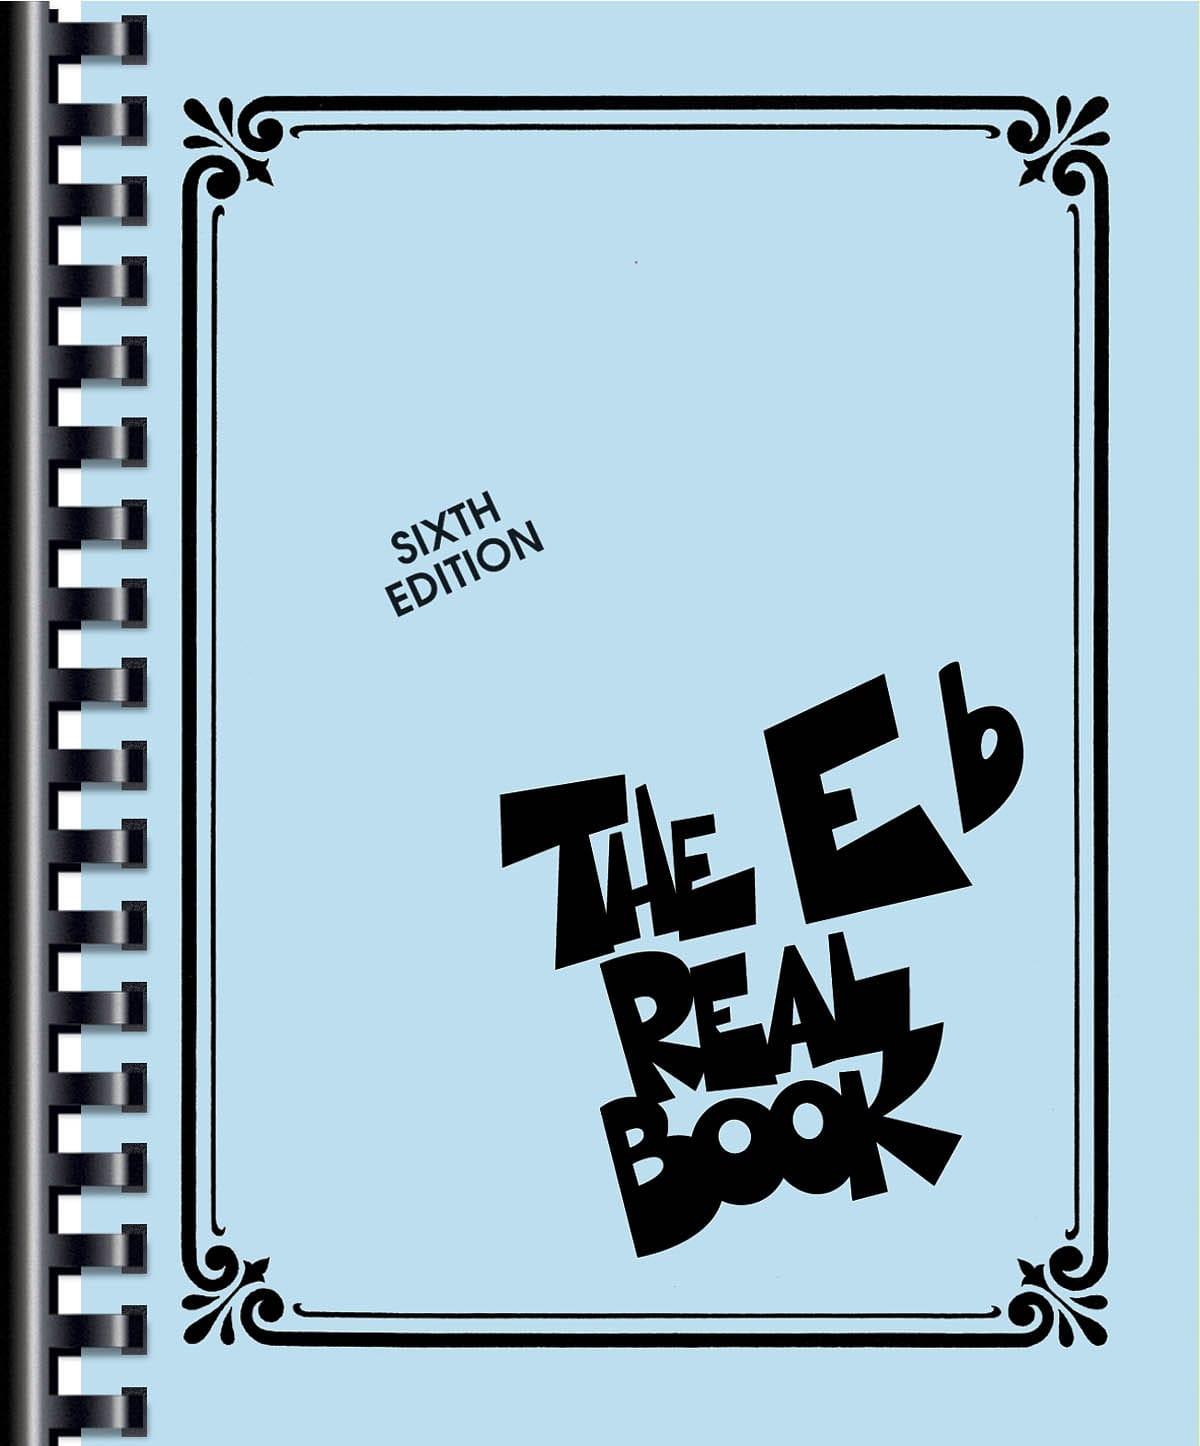 The real book volume 1 sixth edition - laflutedepan.com